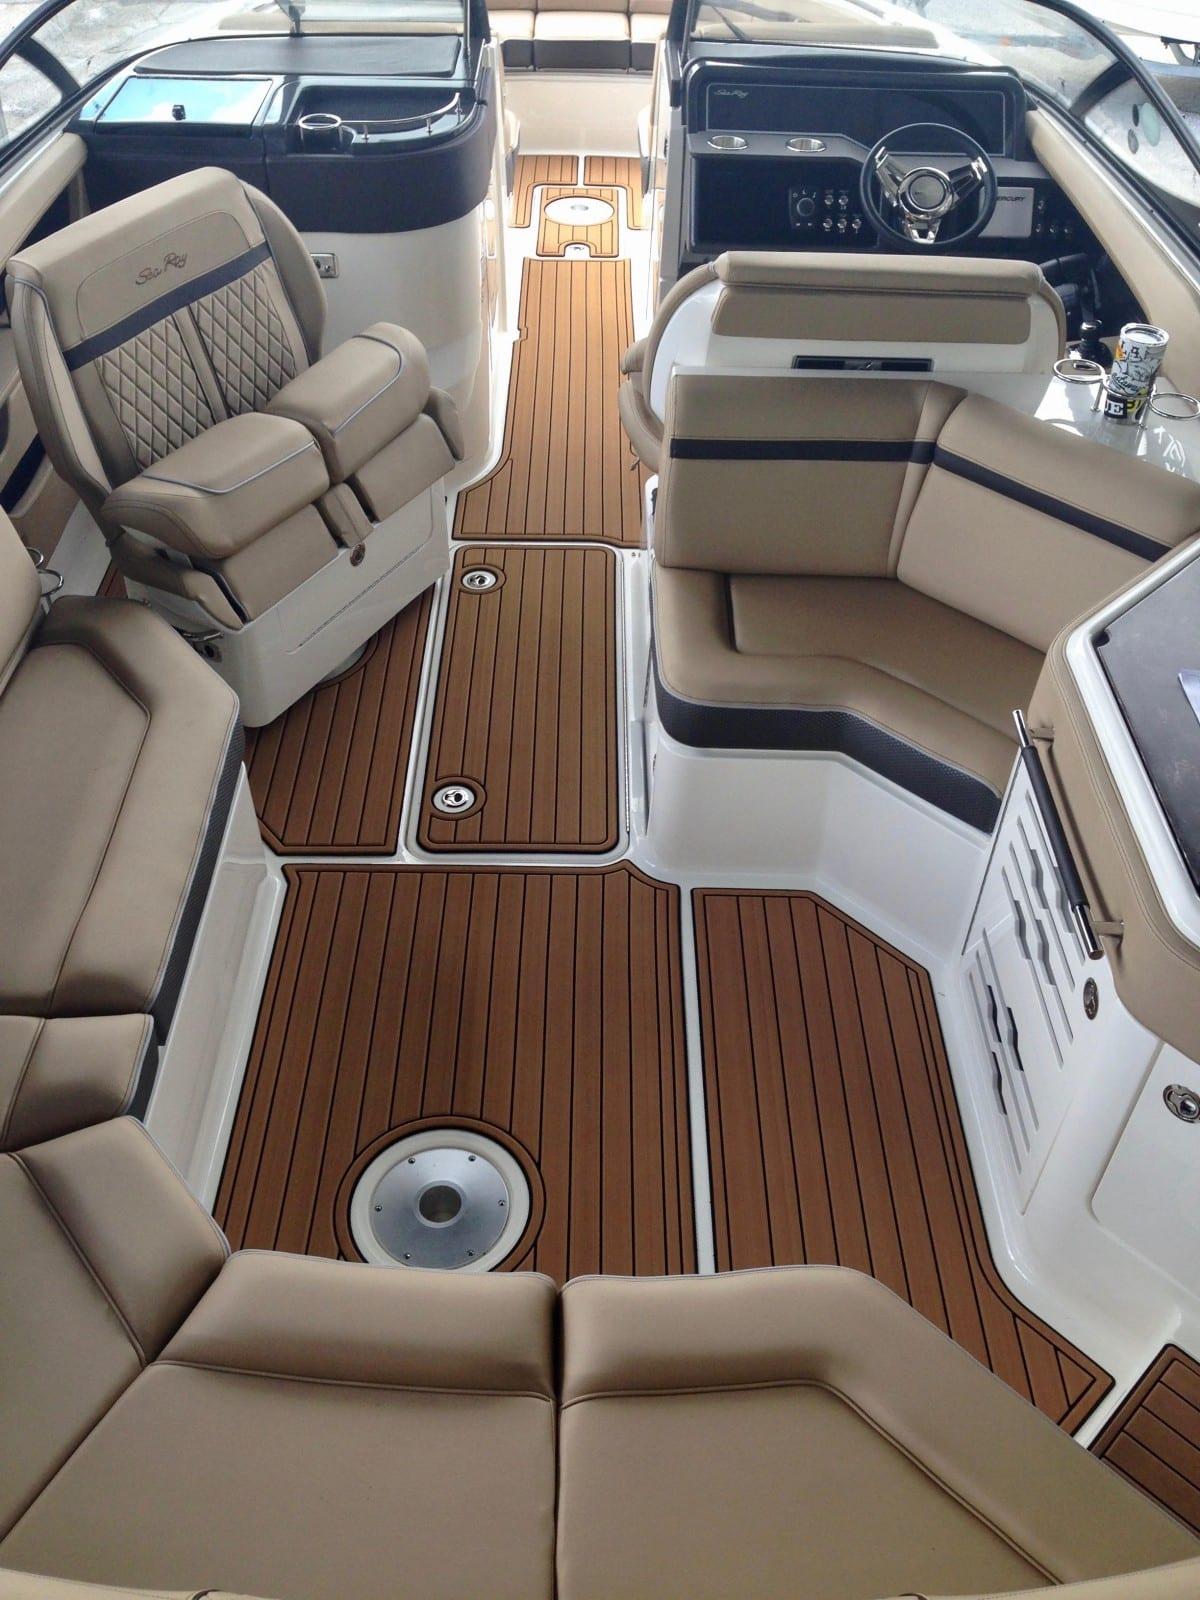 Cruiser Pleasure Boats Castaway Customs